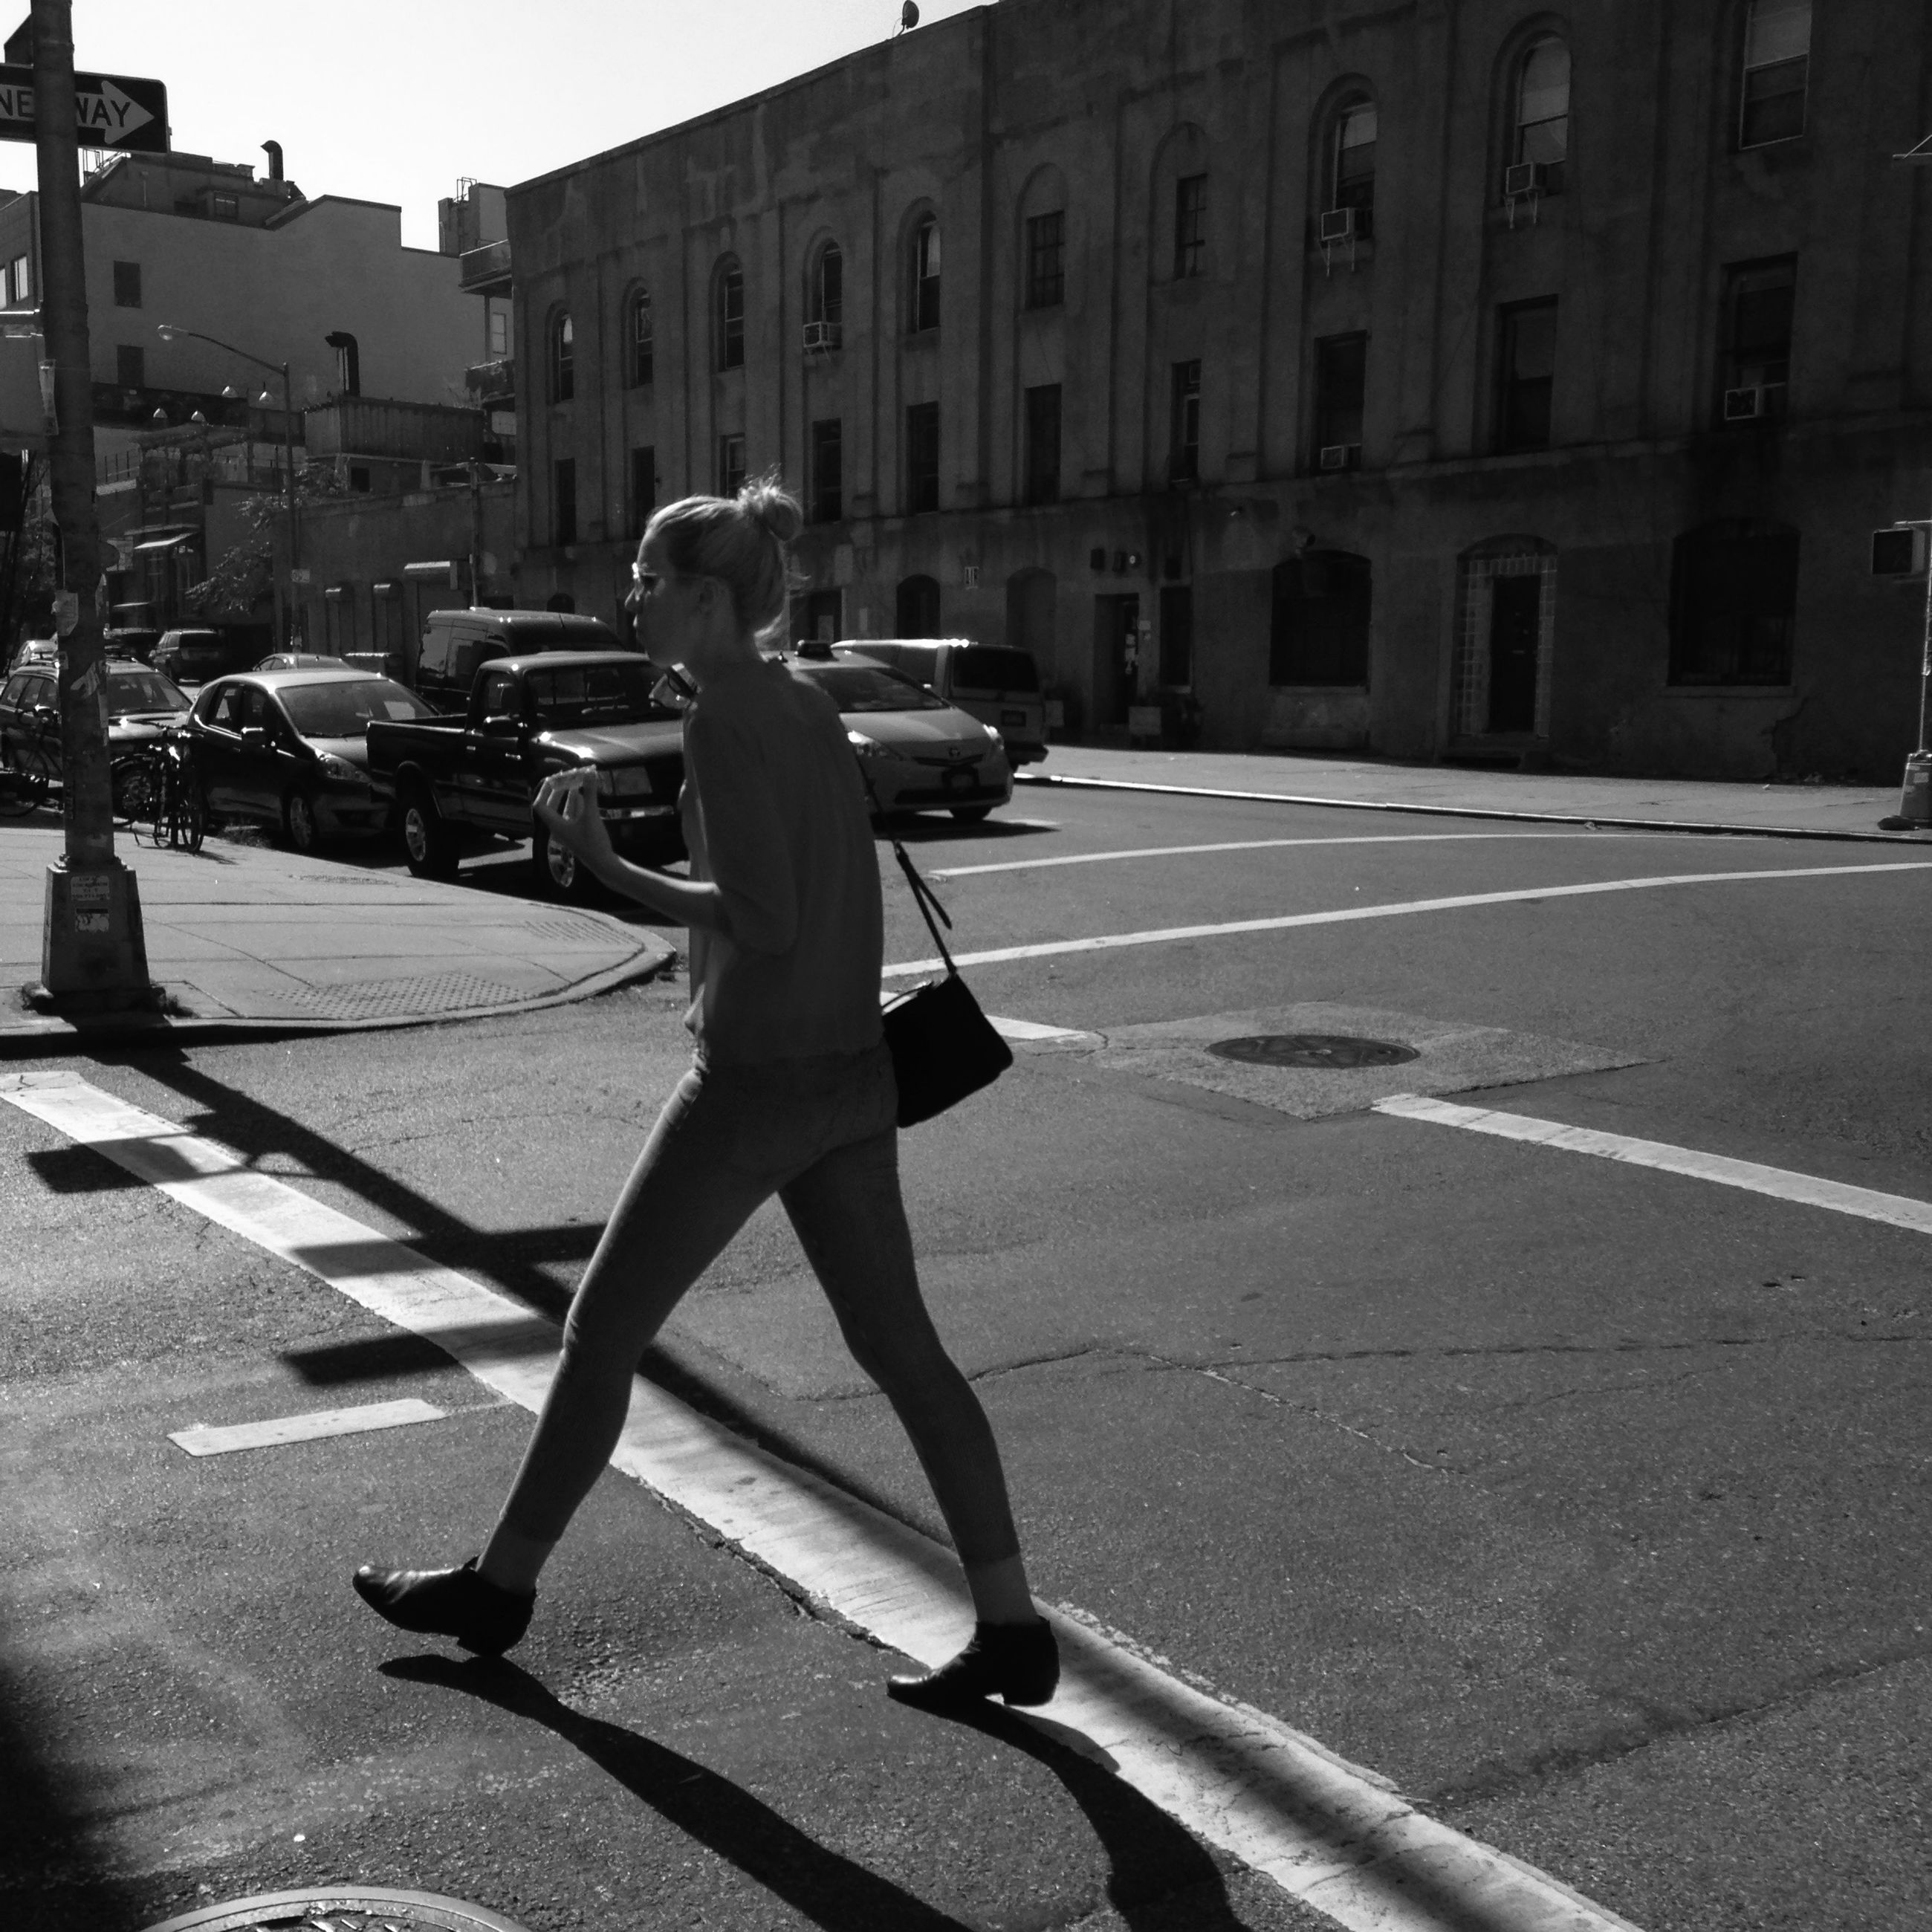 building exterior, street, architecture, built structure, city, transportation, city life, lifestyles, walking, car, men, road, city street, mode of transport, sunlight, person, land vehicle, leisure activity